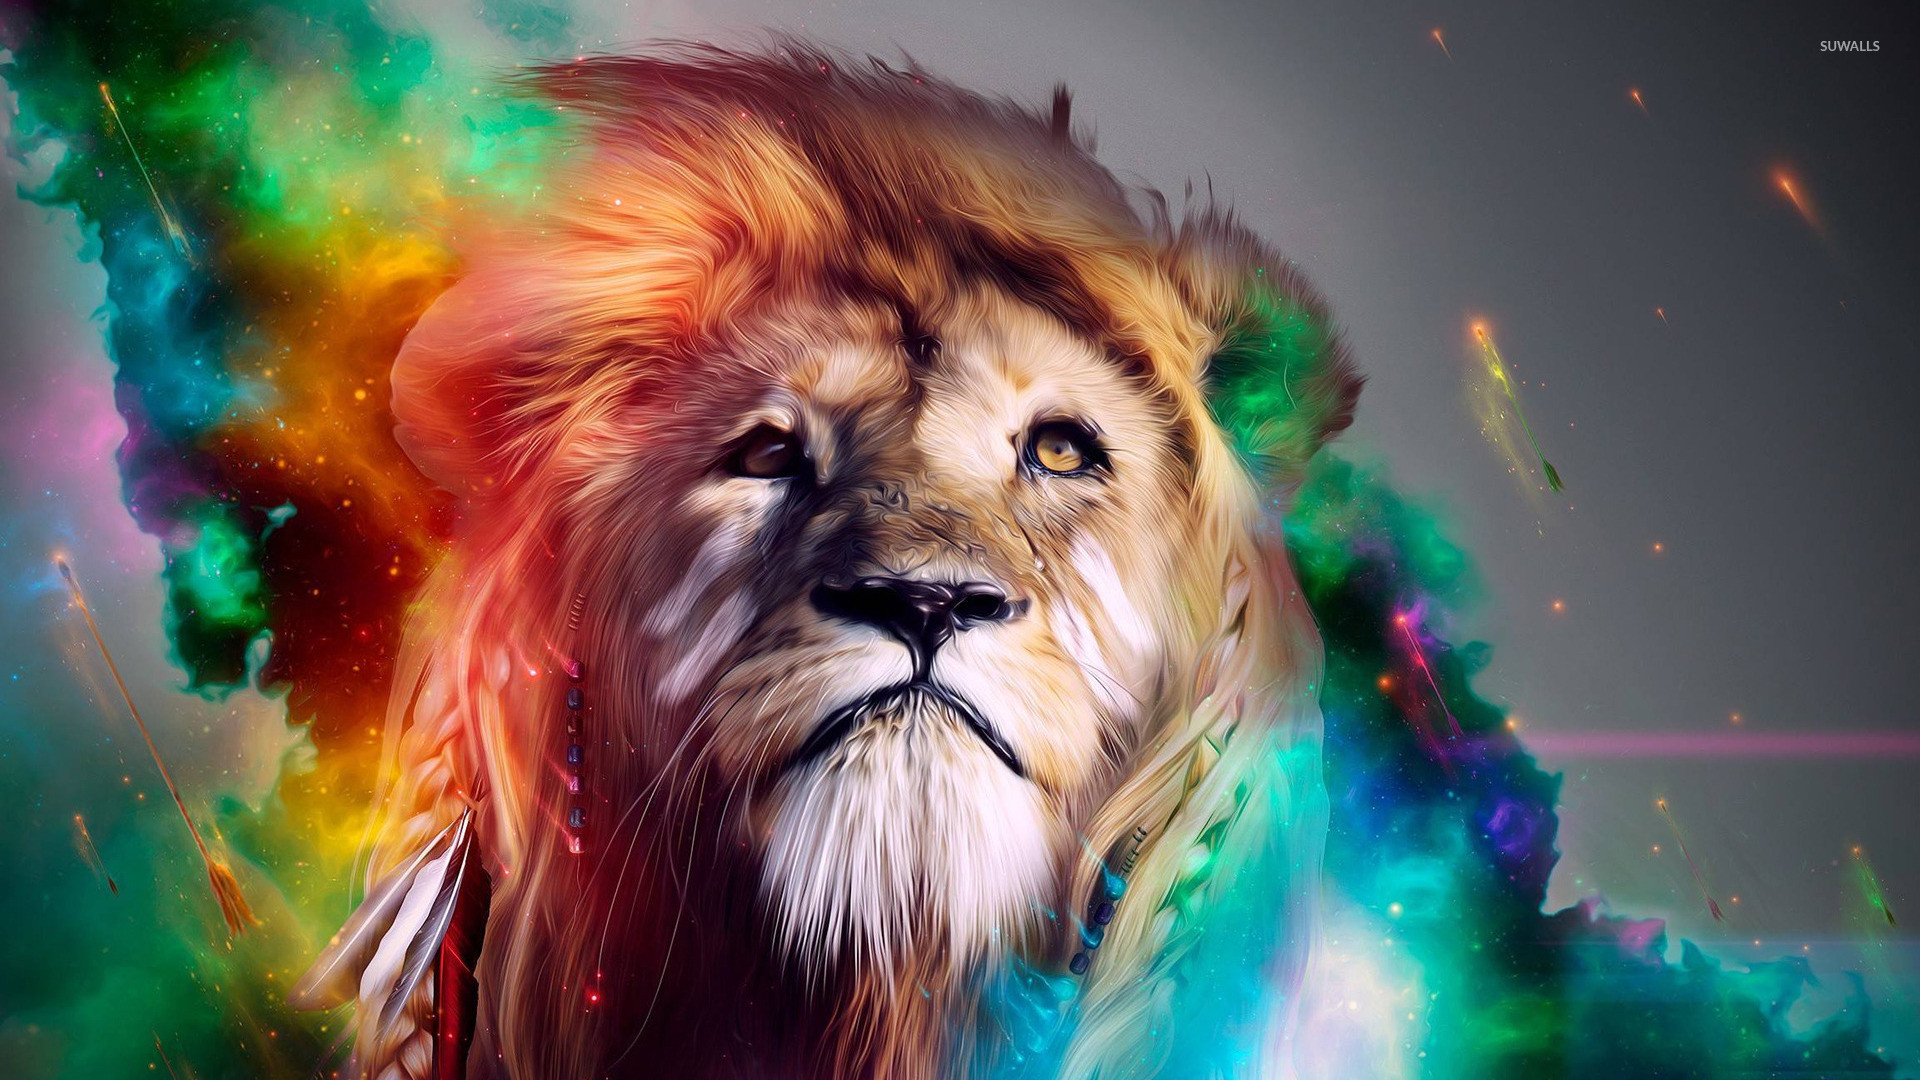 1920x1080 Colorful lion wallpaper - Digital Art wallpapers - #15854